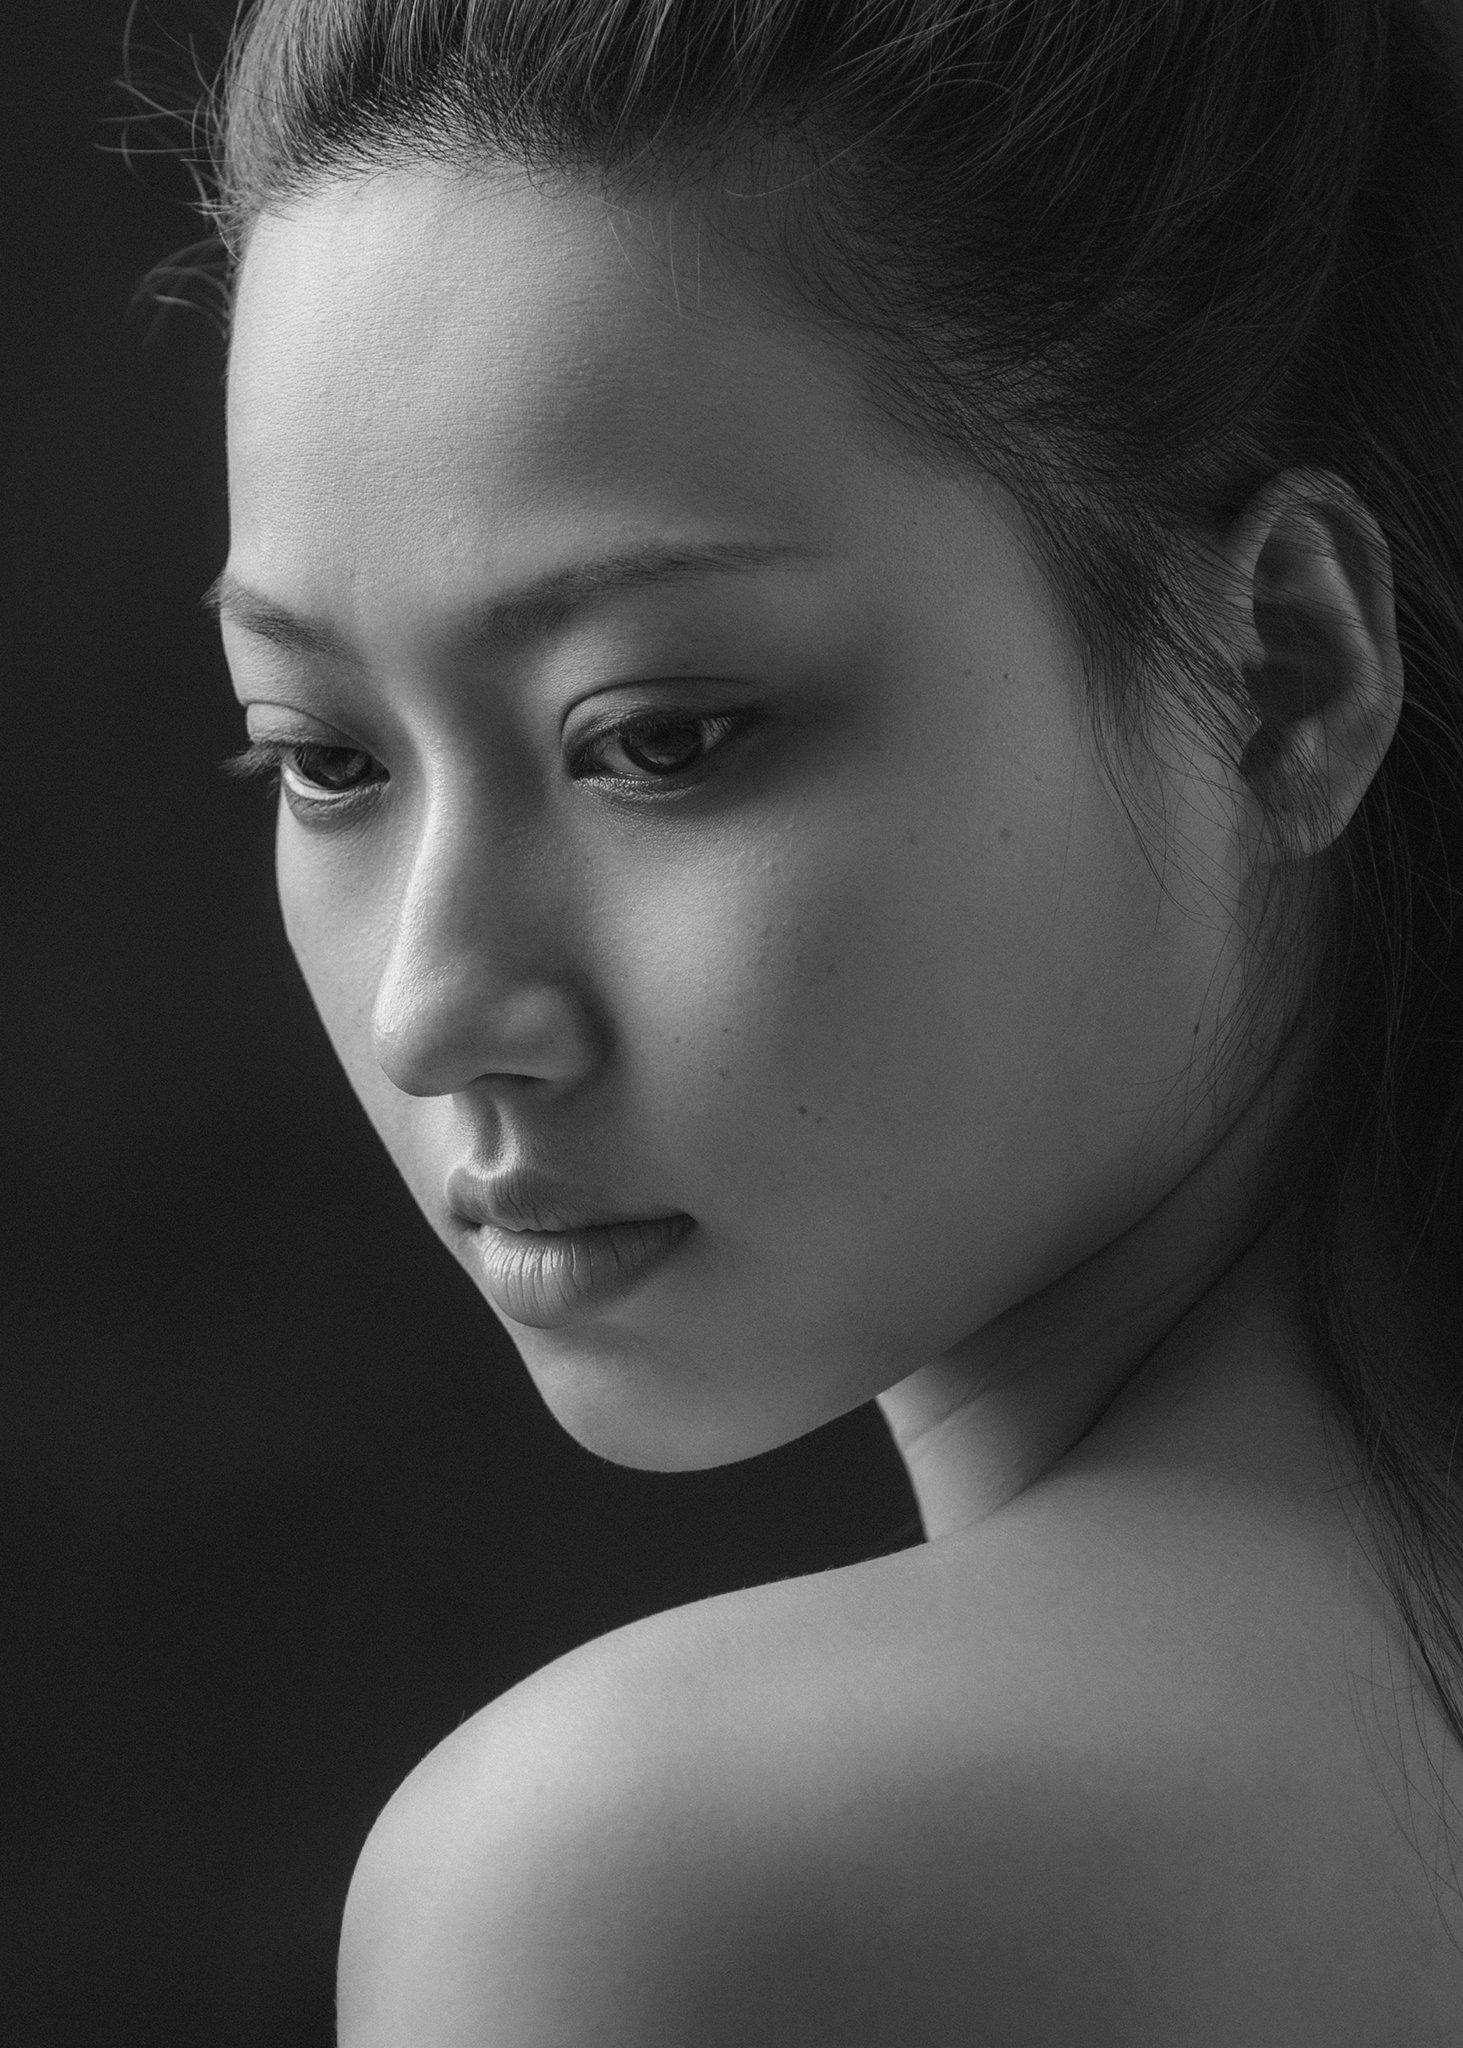 portrait, people, face, studio, dark, light, asian, vietnam, vietnamese, young, attractive, female, girl, black and white, bw, monochrome, Hoang Viet Nguyen